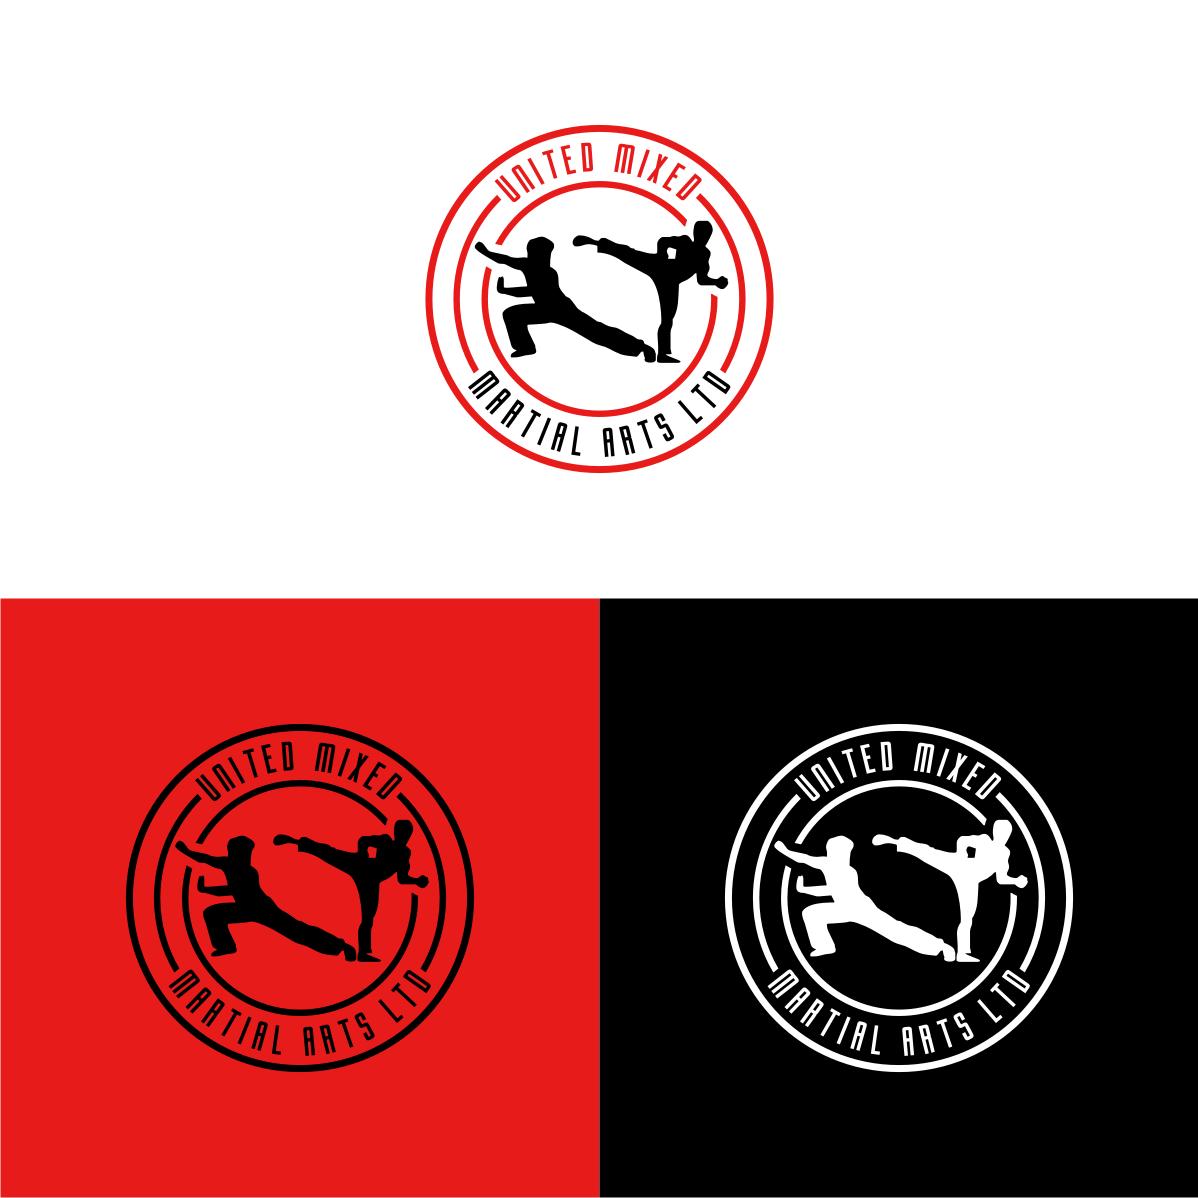 Logo Design by Analla Art - Entry No. 96 in the Logo Design Contest Artistic Logo Design for United Mixed Martial Arts Ltd..